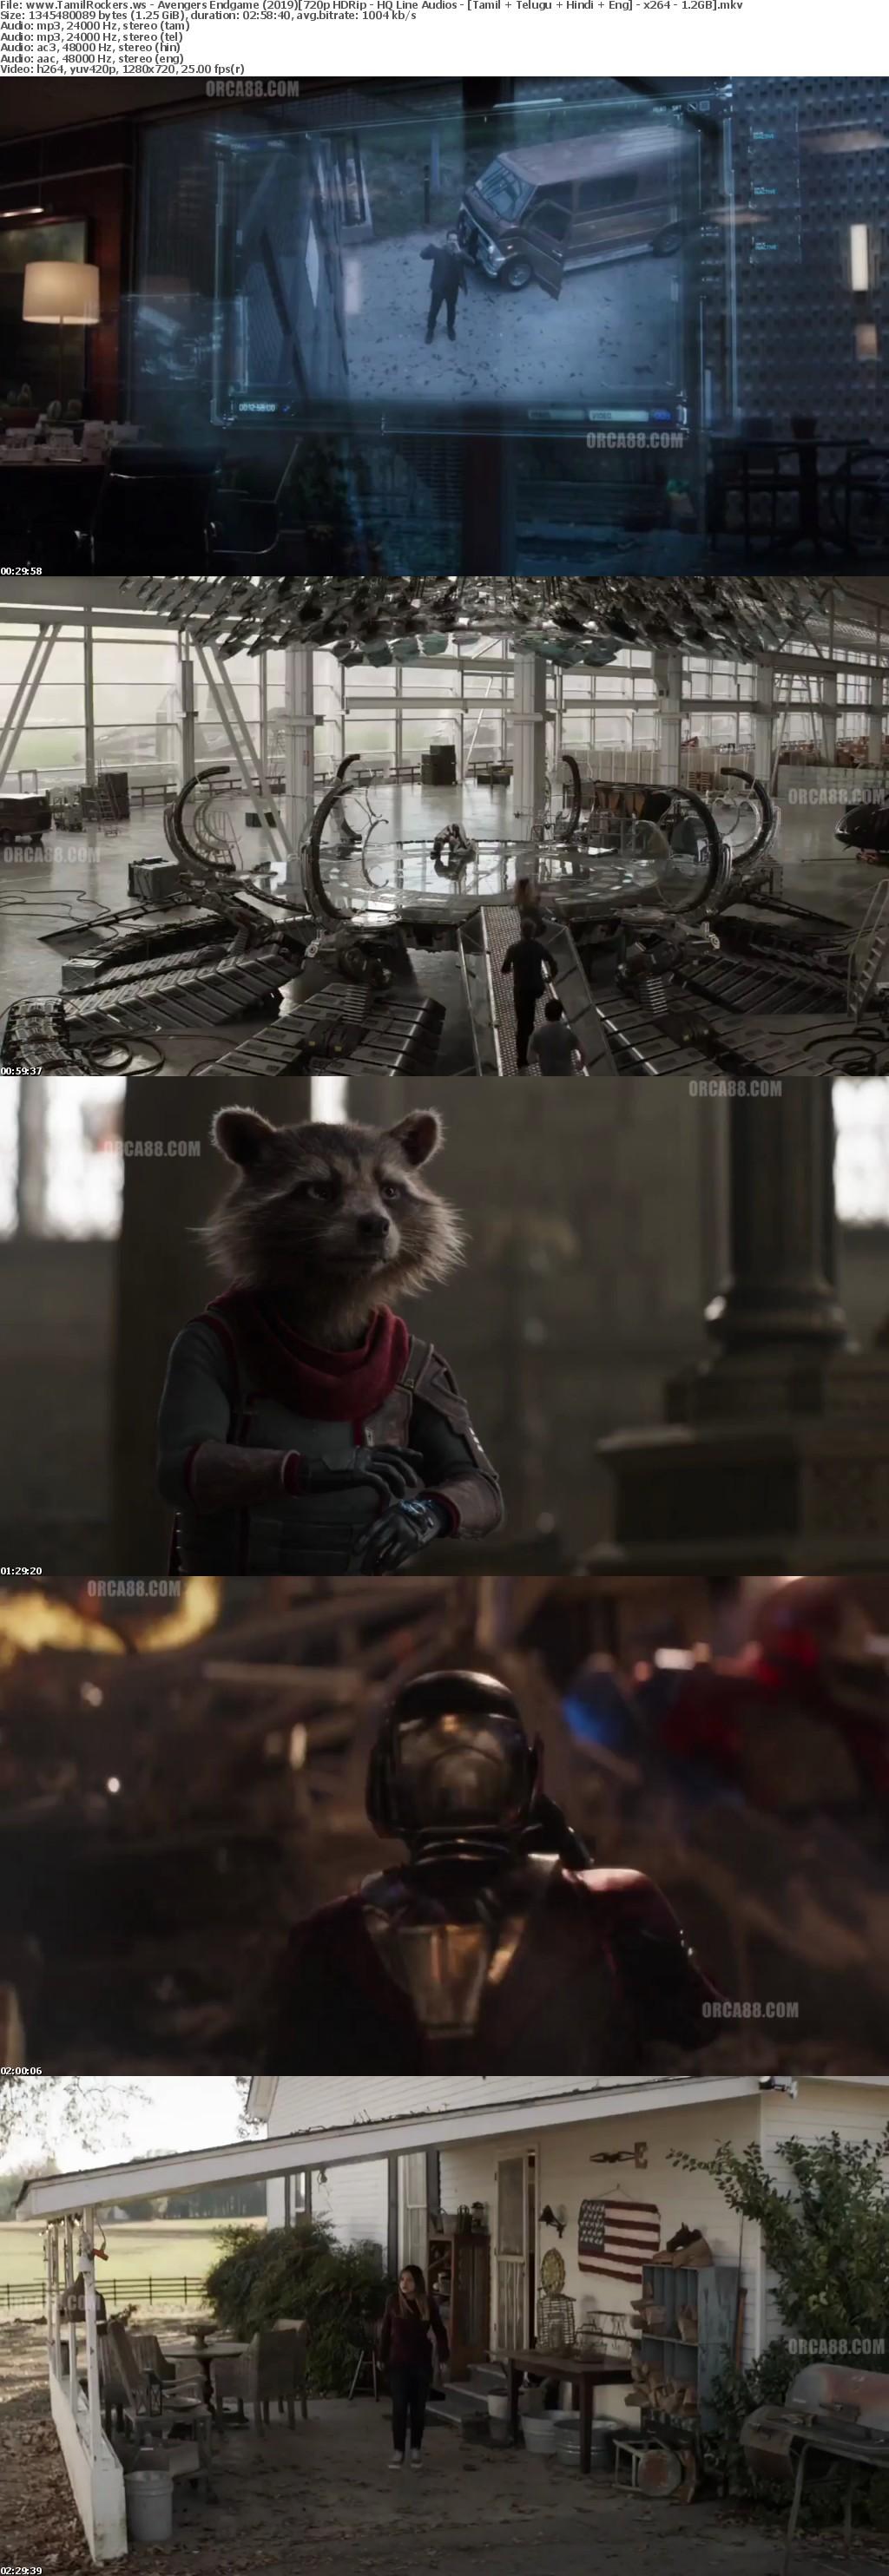 Avengers Endgame (2019) 720p HDRip - HQ Line Audios - Tamil + Telugu